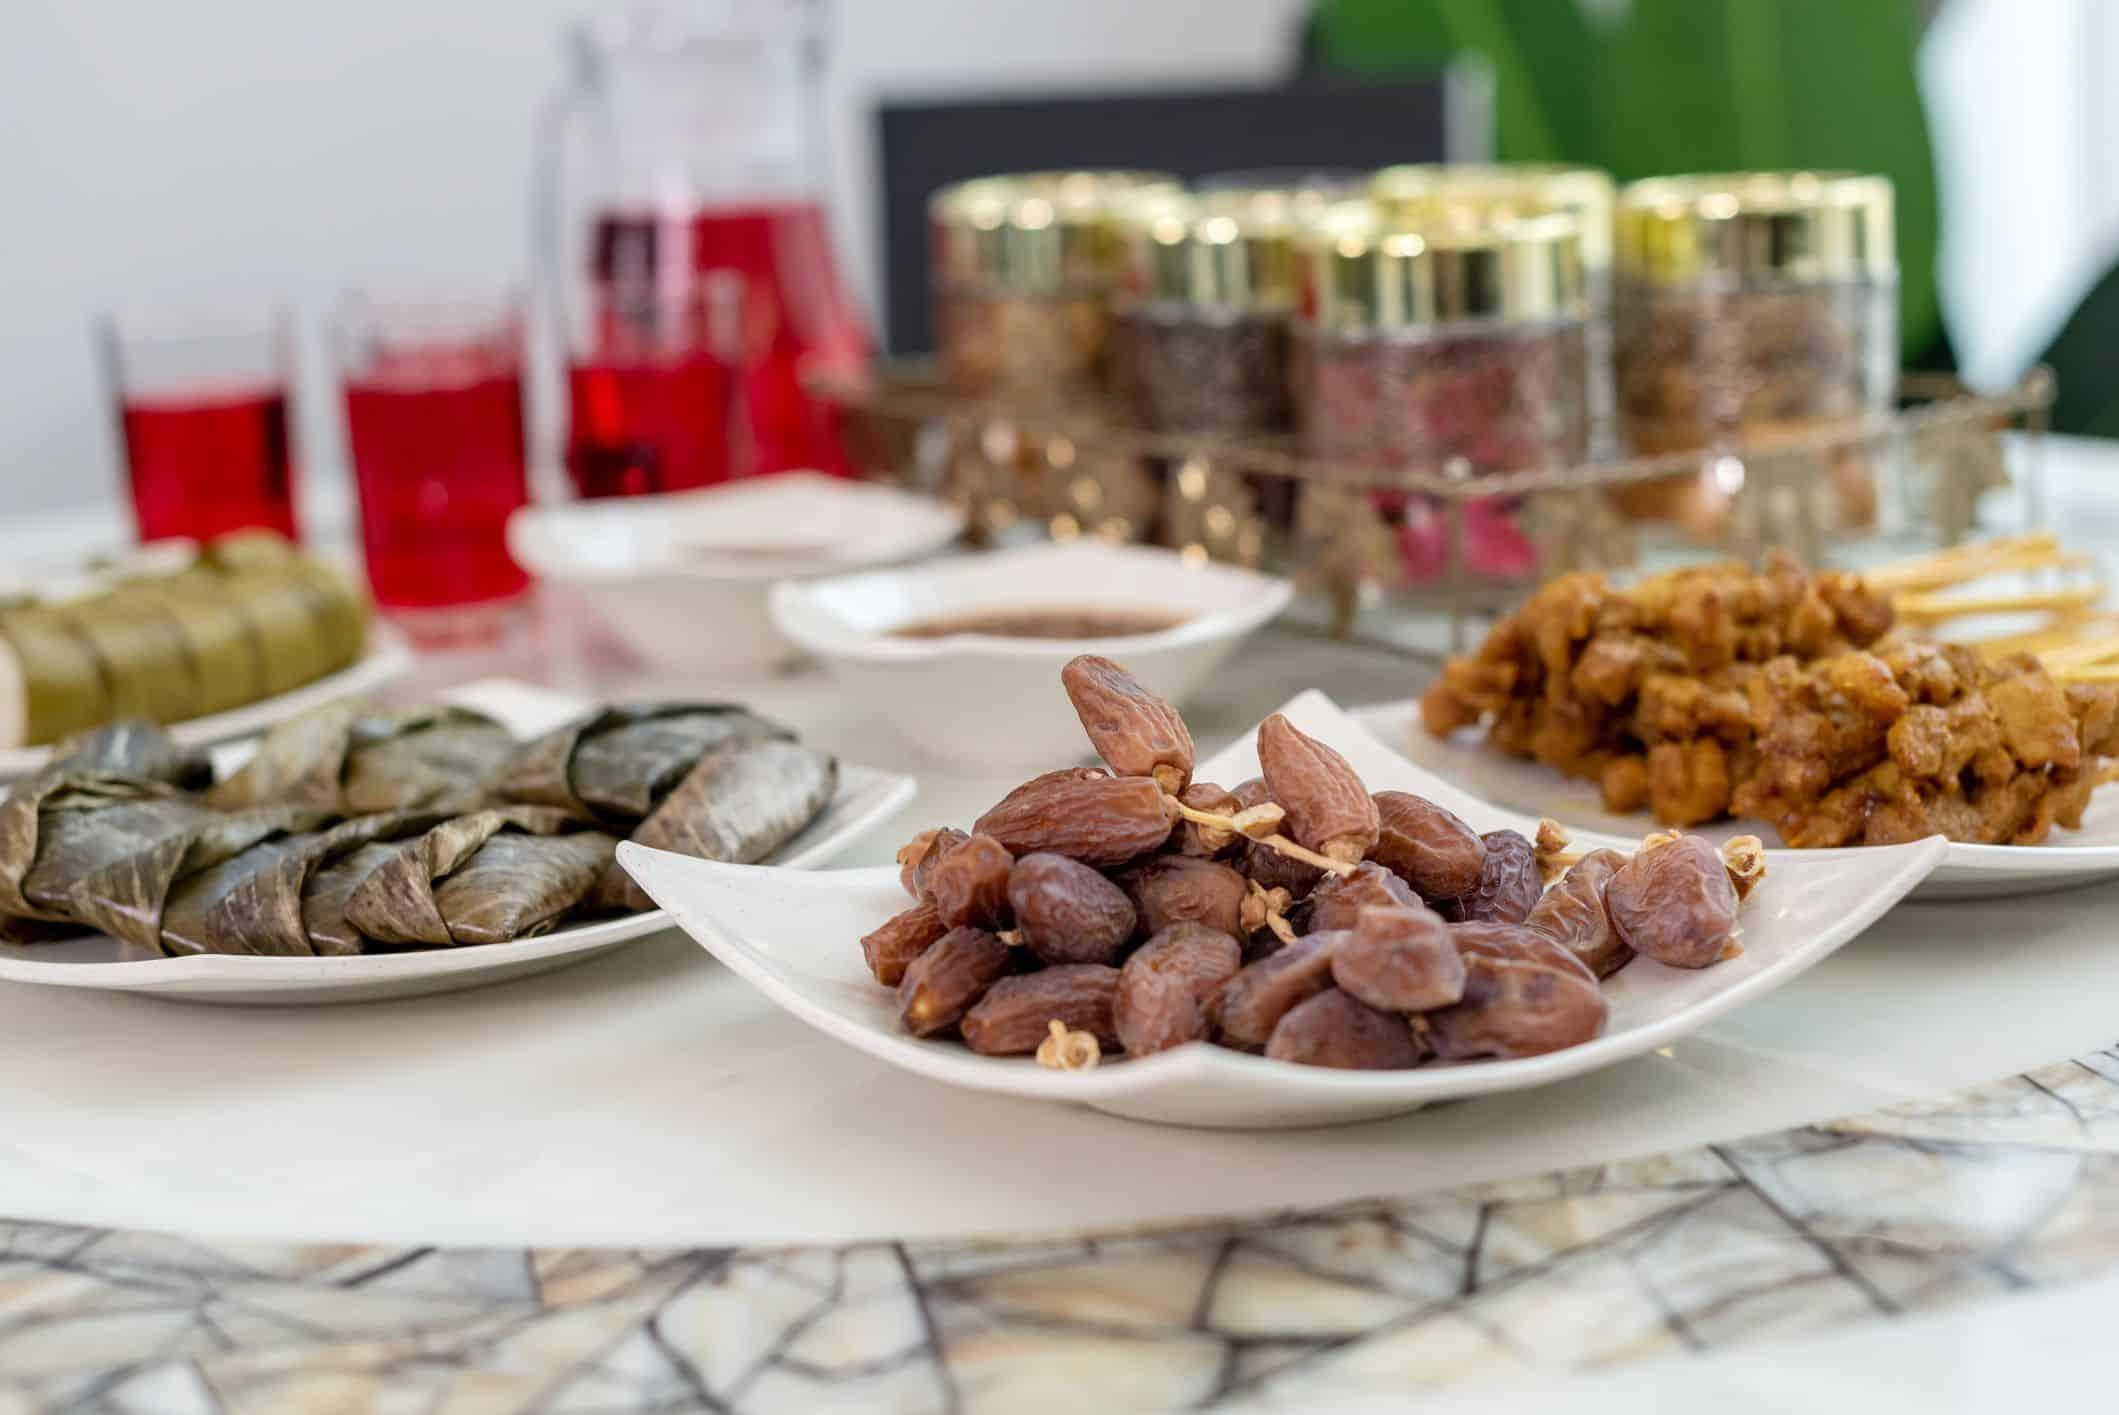 نظام غذائي خلال شهر رمضان